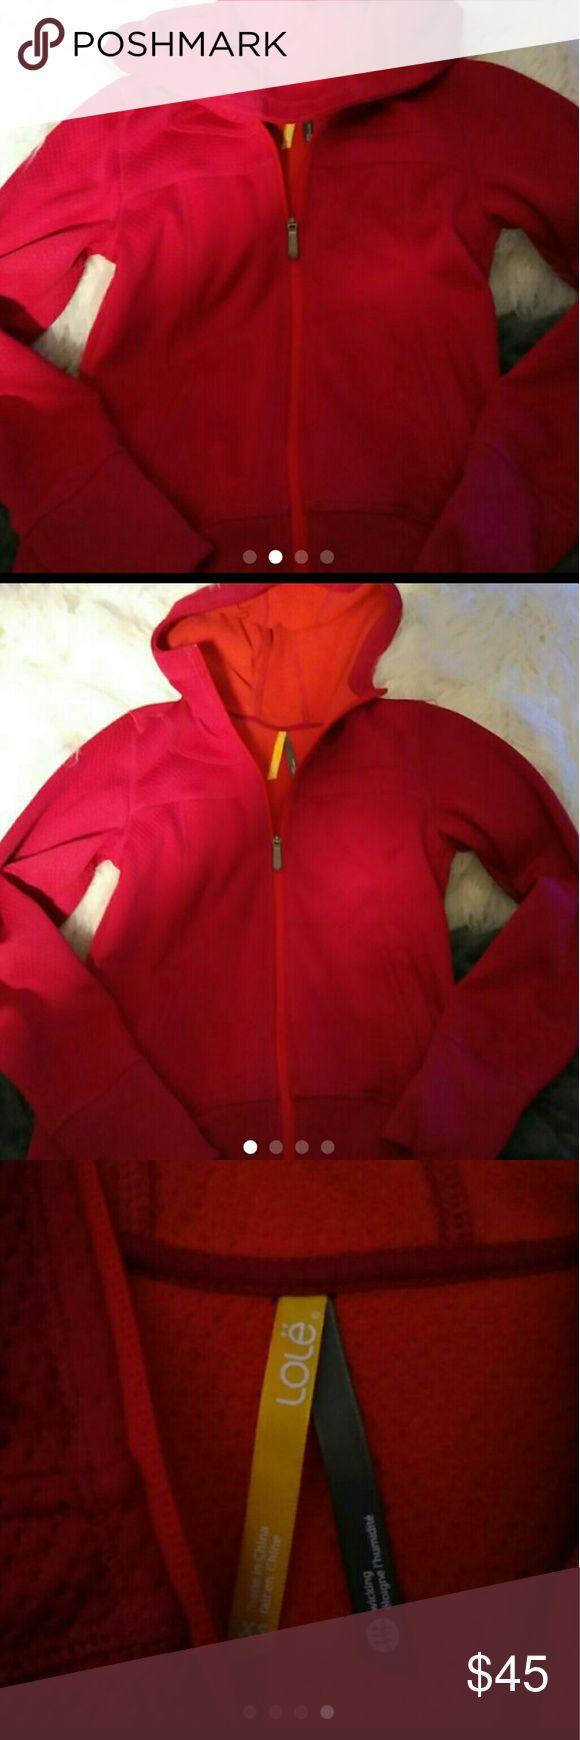 Lole Lole athletic jacket full zip bnwot has lole on hood this is more like a maroon color Lole Jackets & Coats